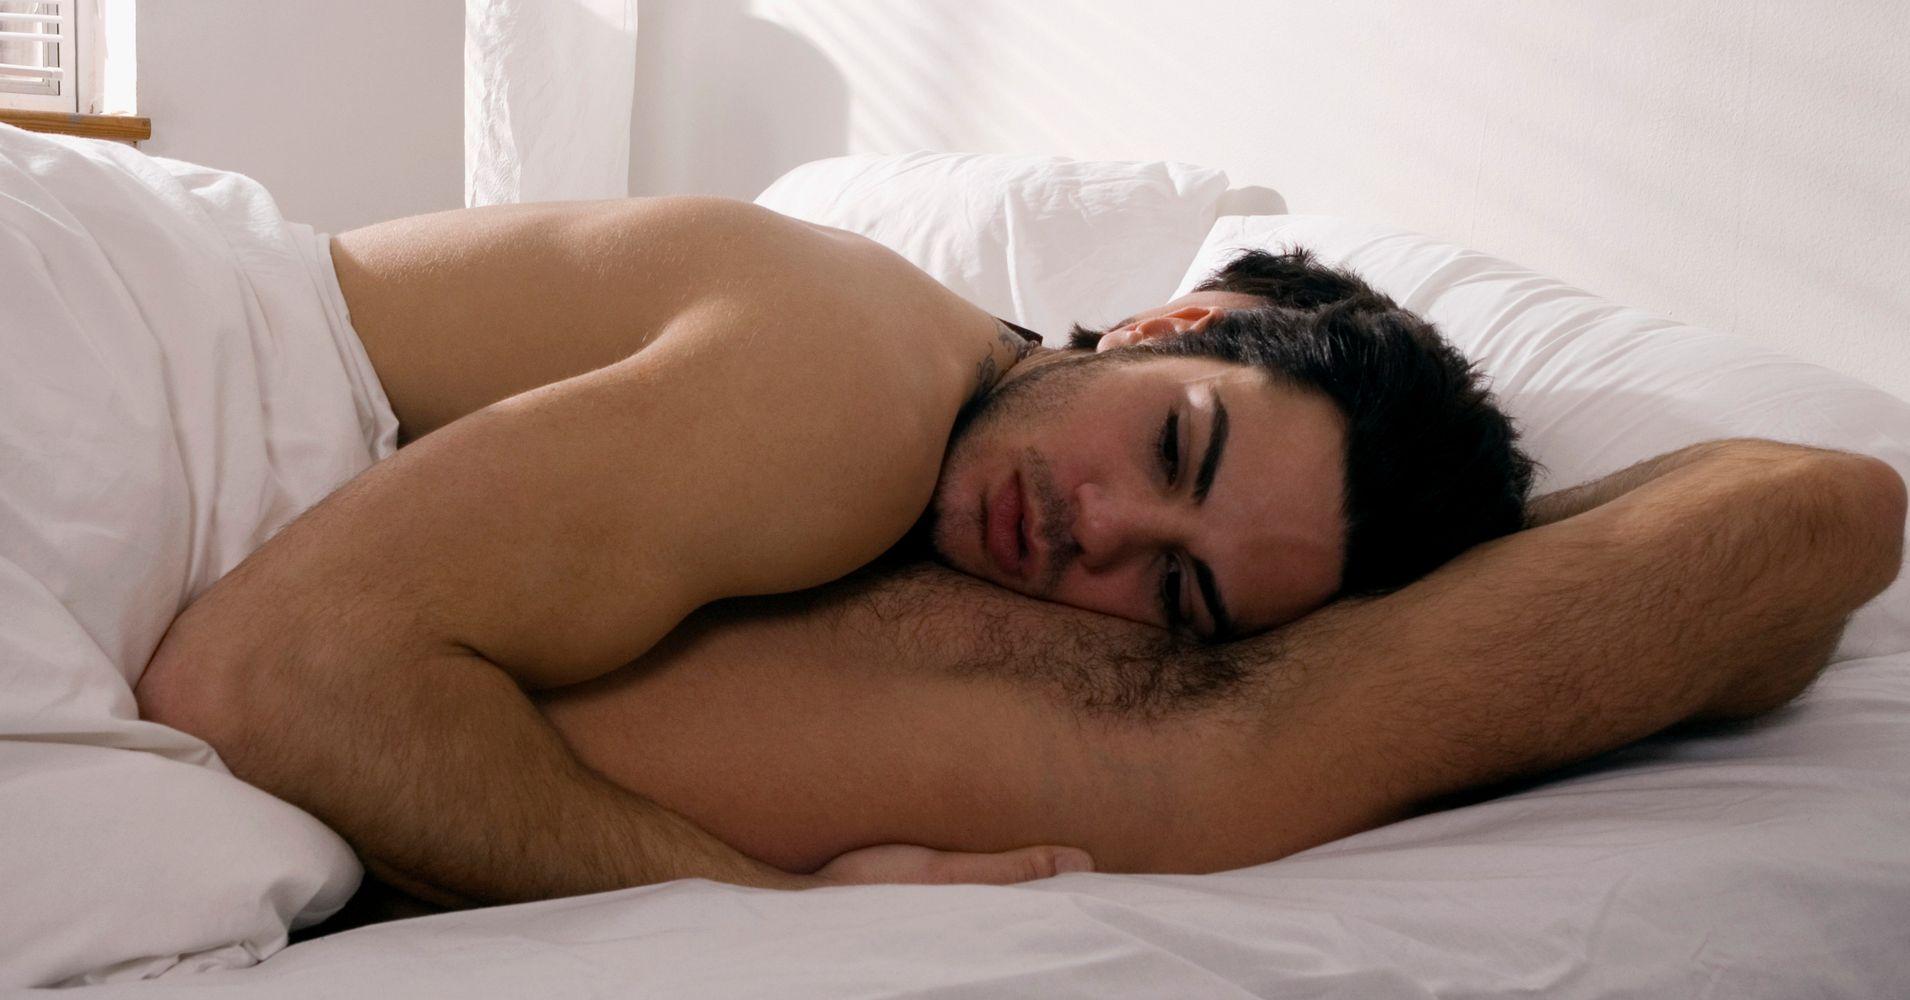 Naked white male orgasm symptoms